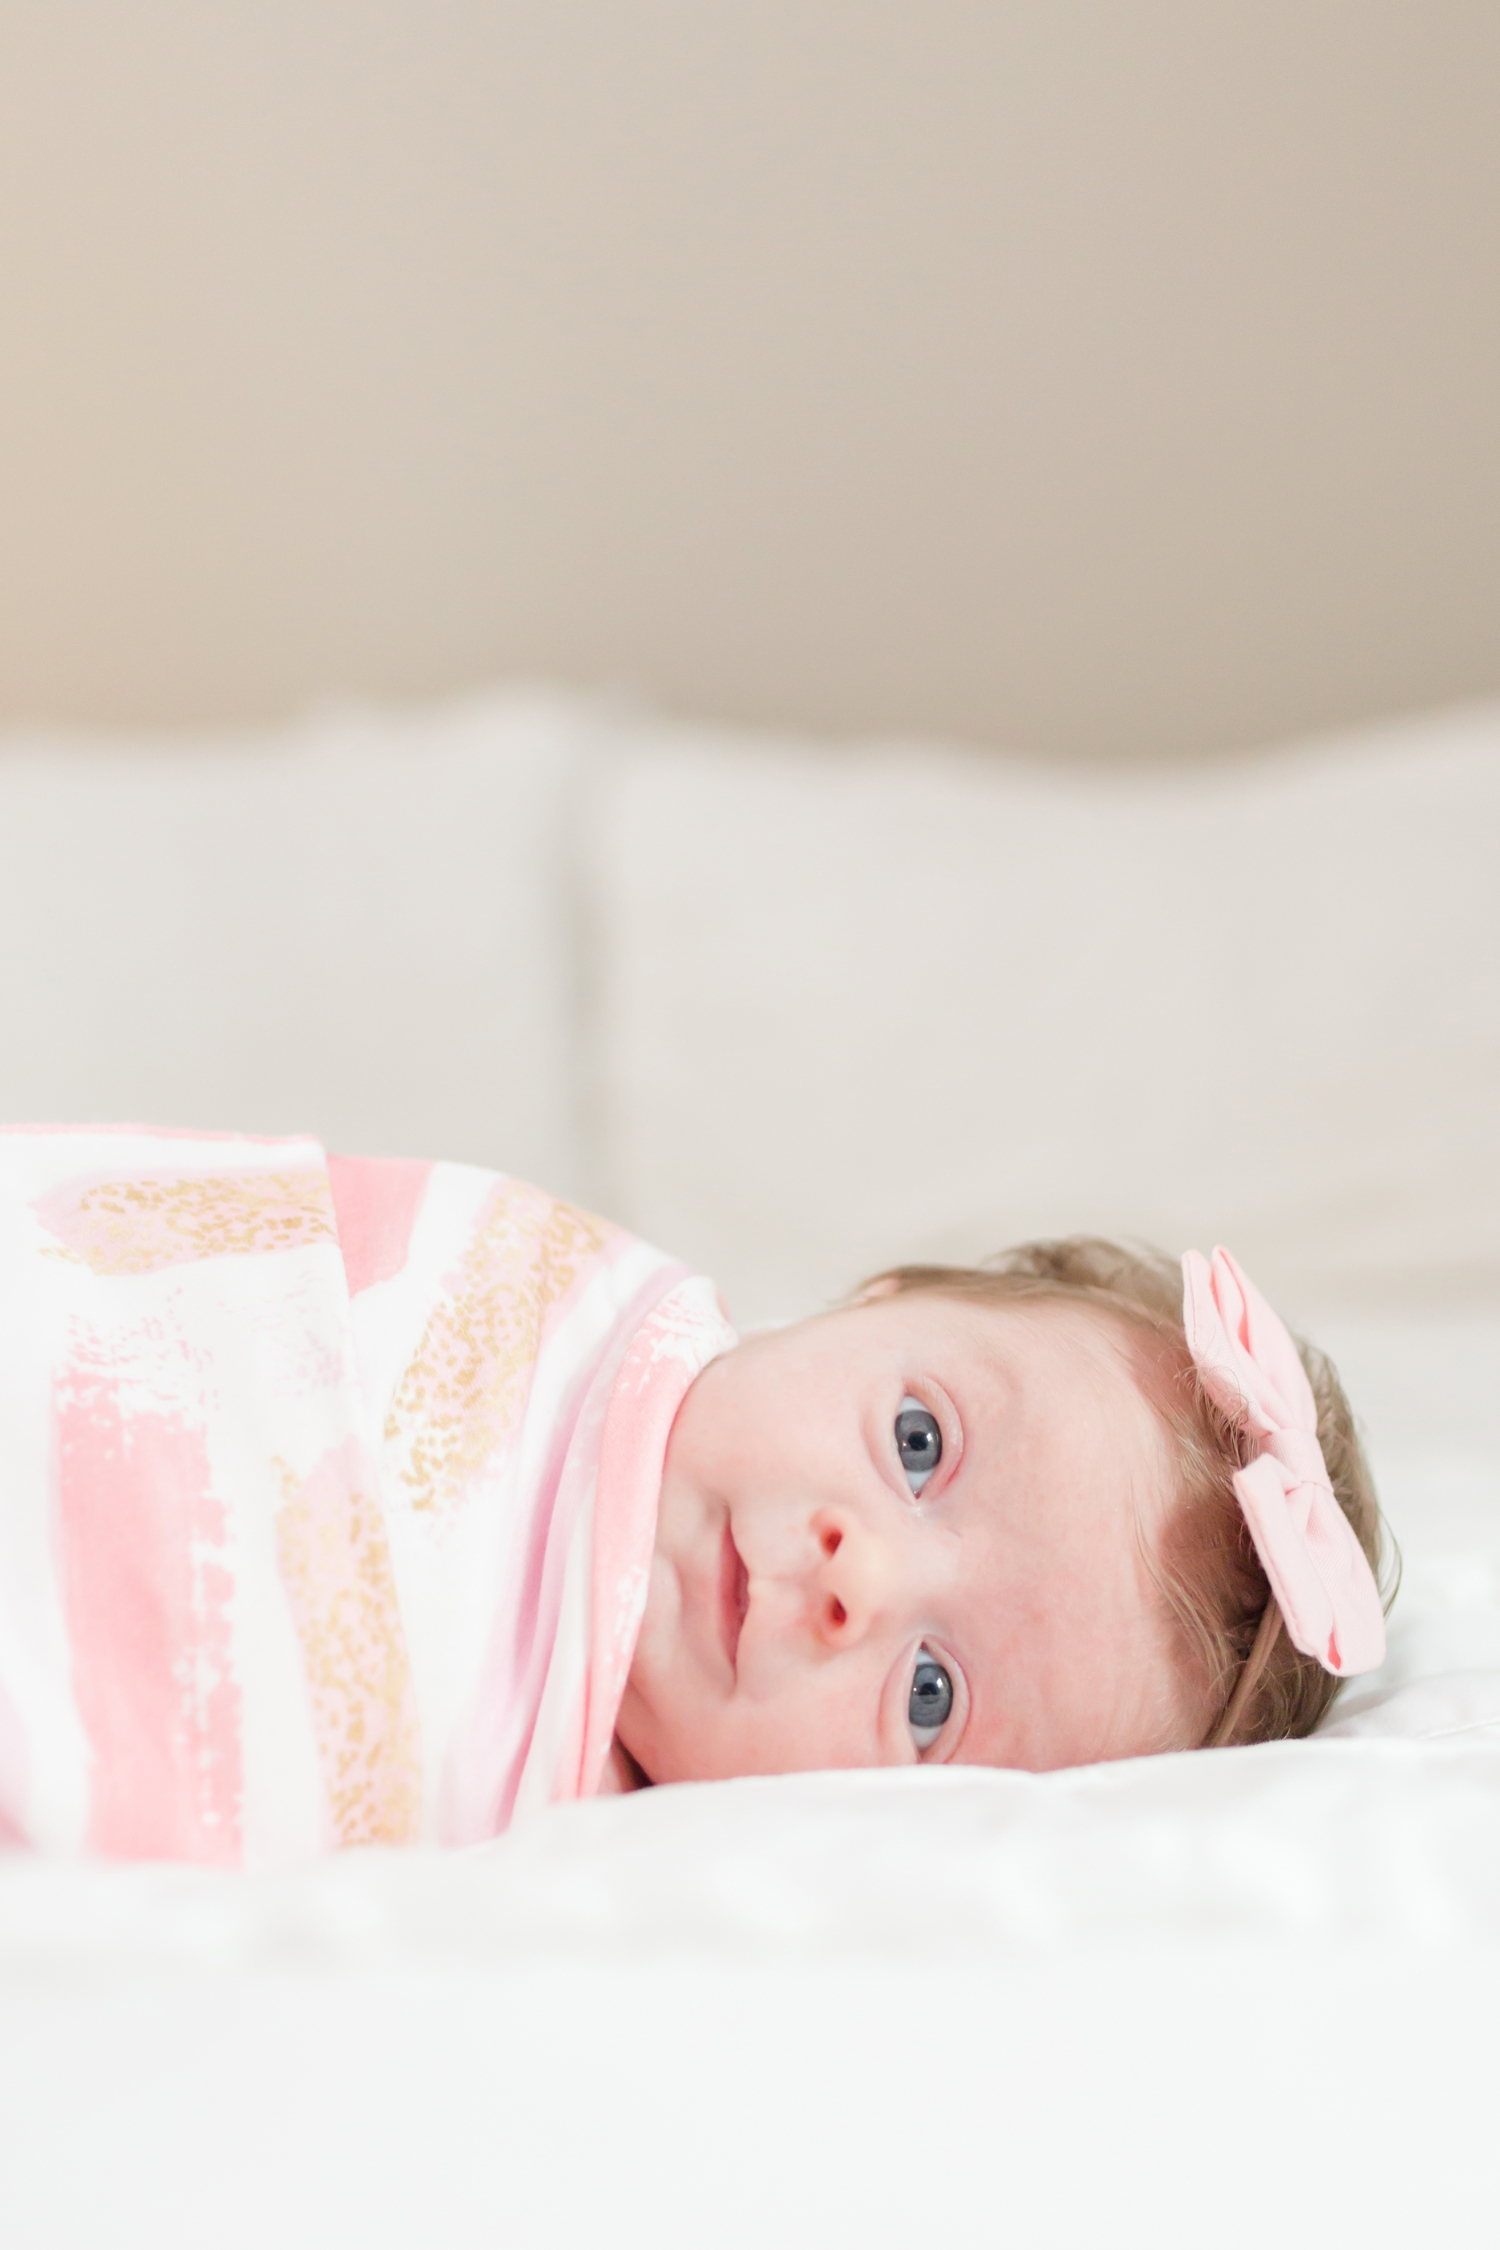 Miano Newborn-110_anna grace photography newborn photography baltimore maryland newborn and family photographer photo.jpg